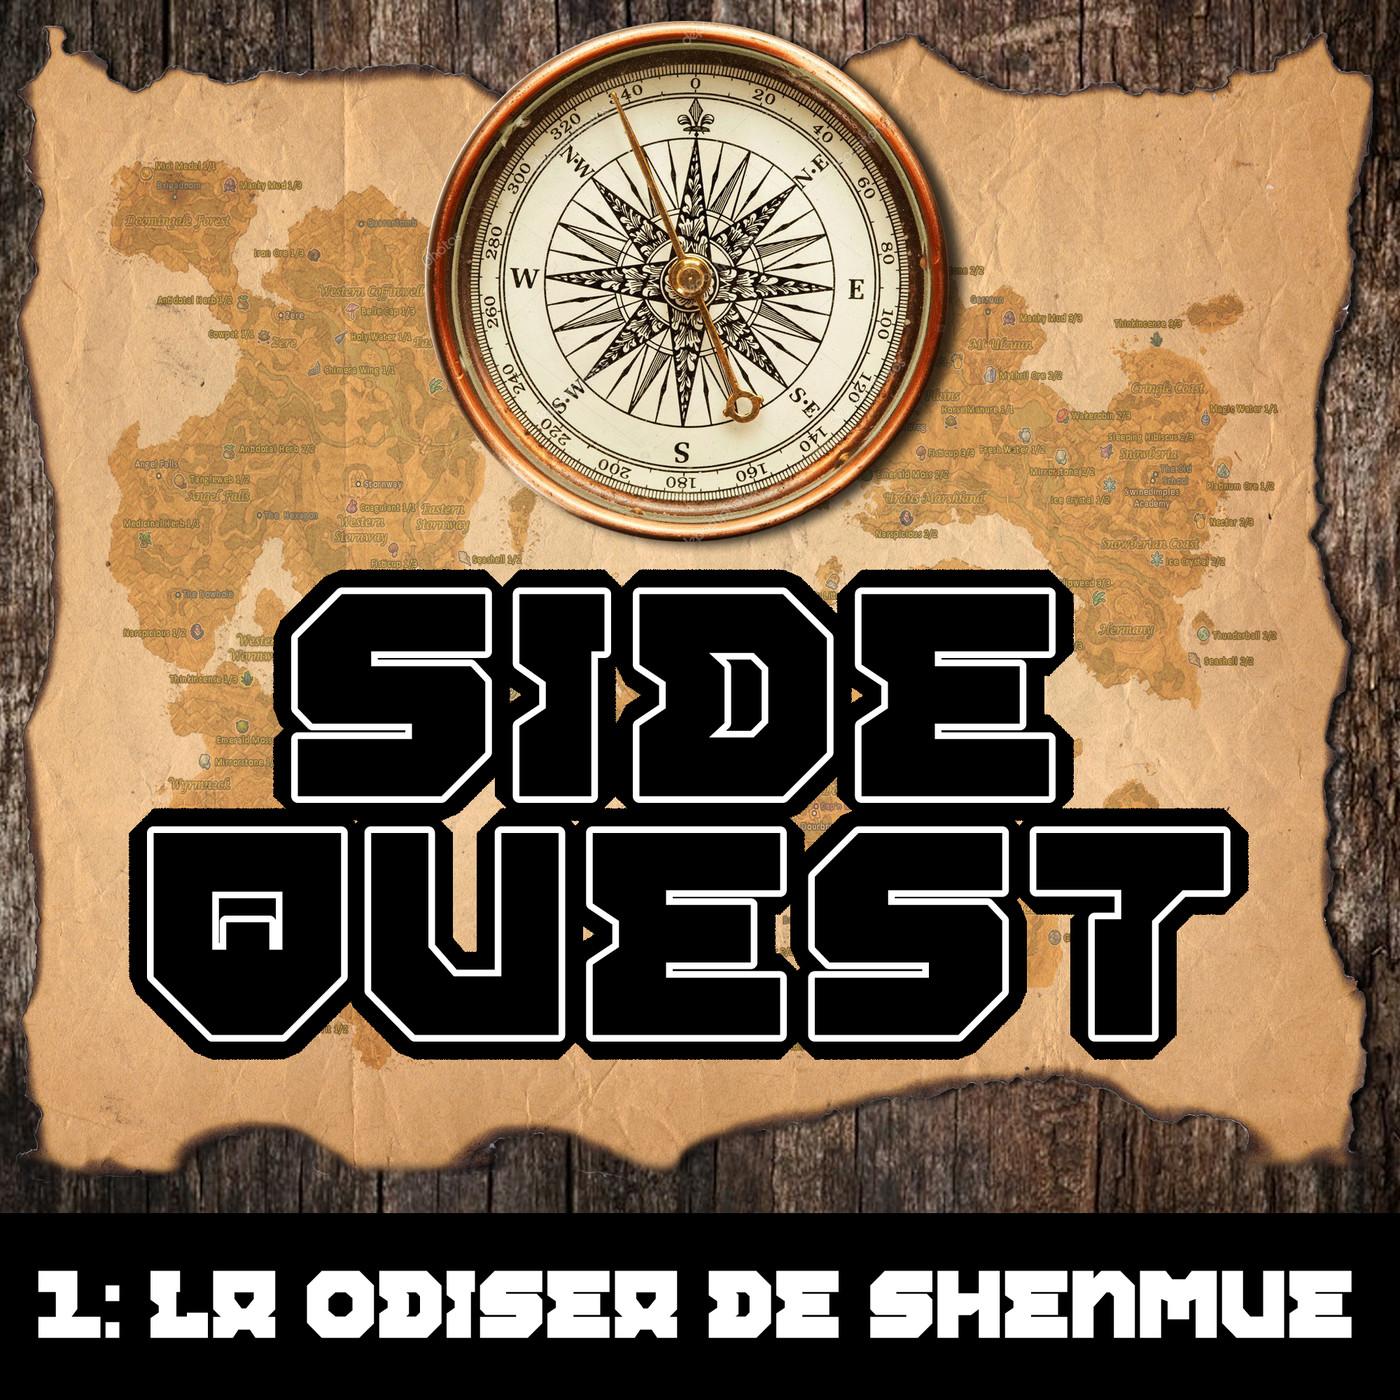 Side Quest 1 : La Odisea de Shenmue